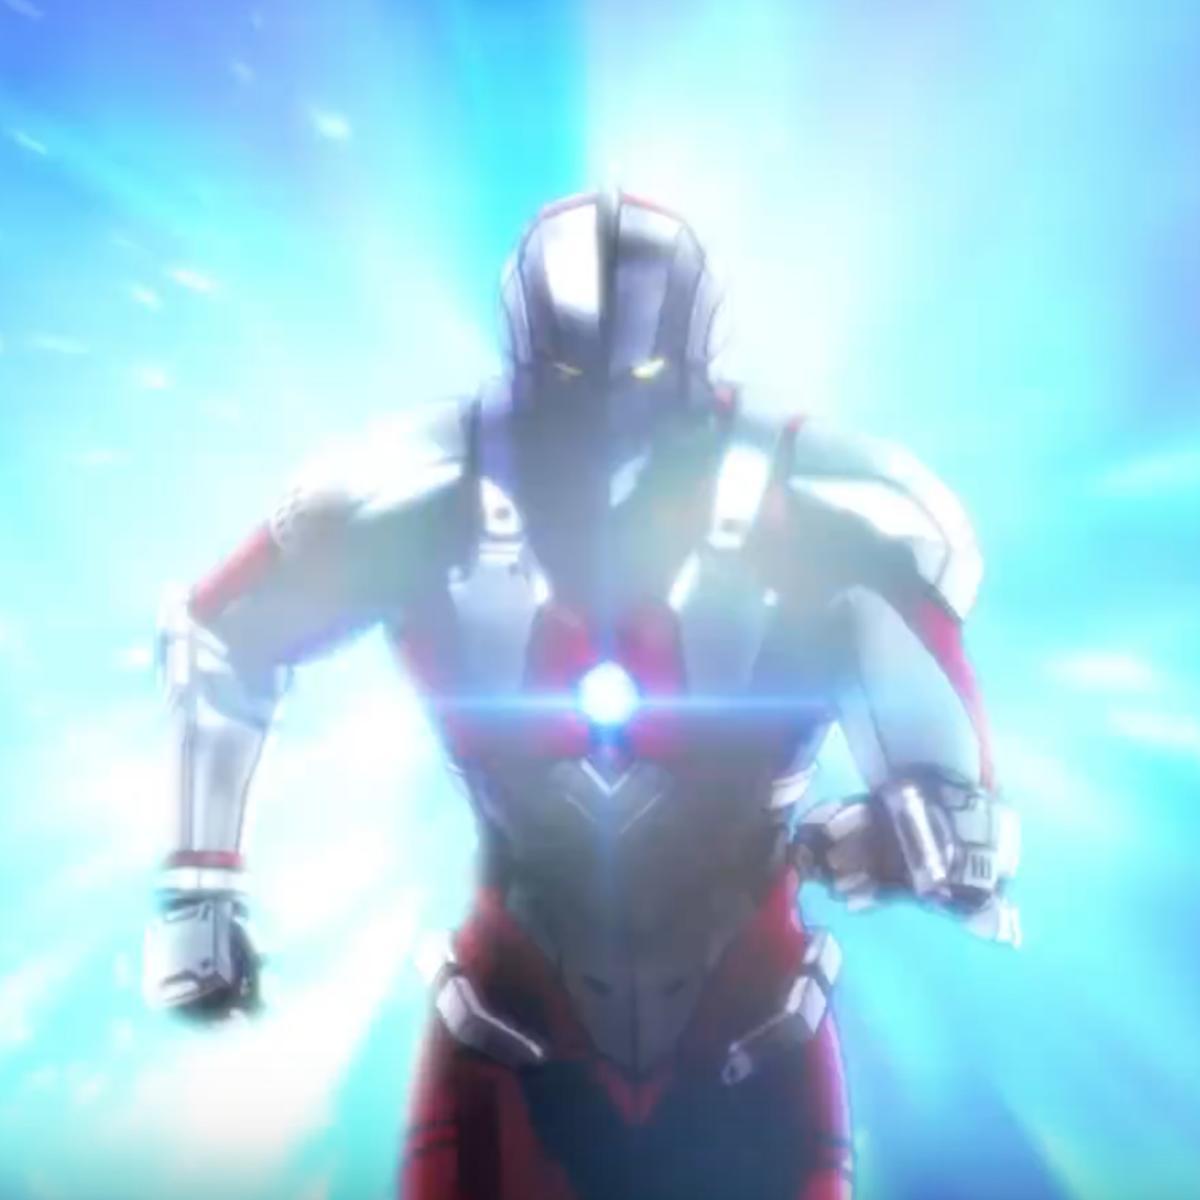 Ultraman animated film